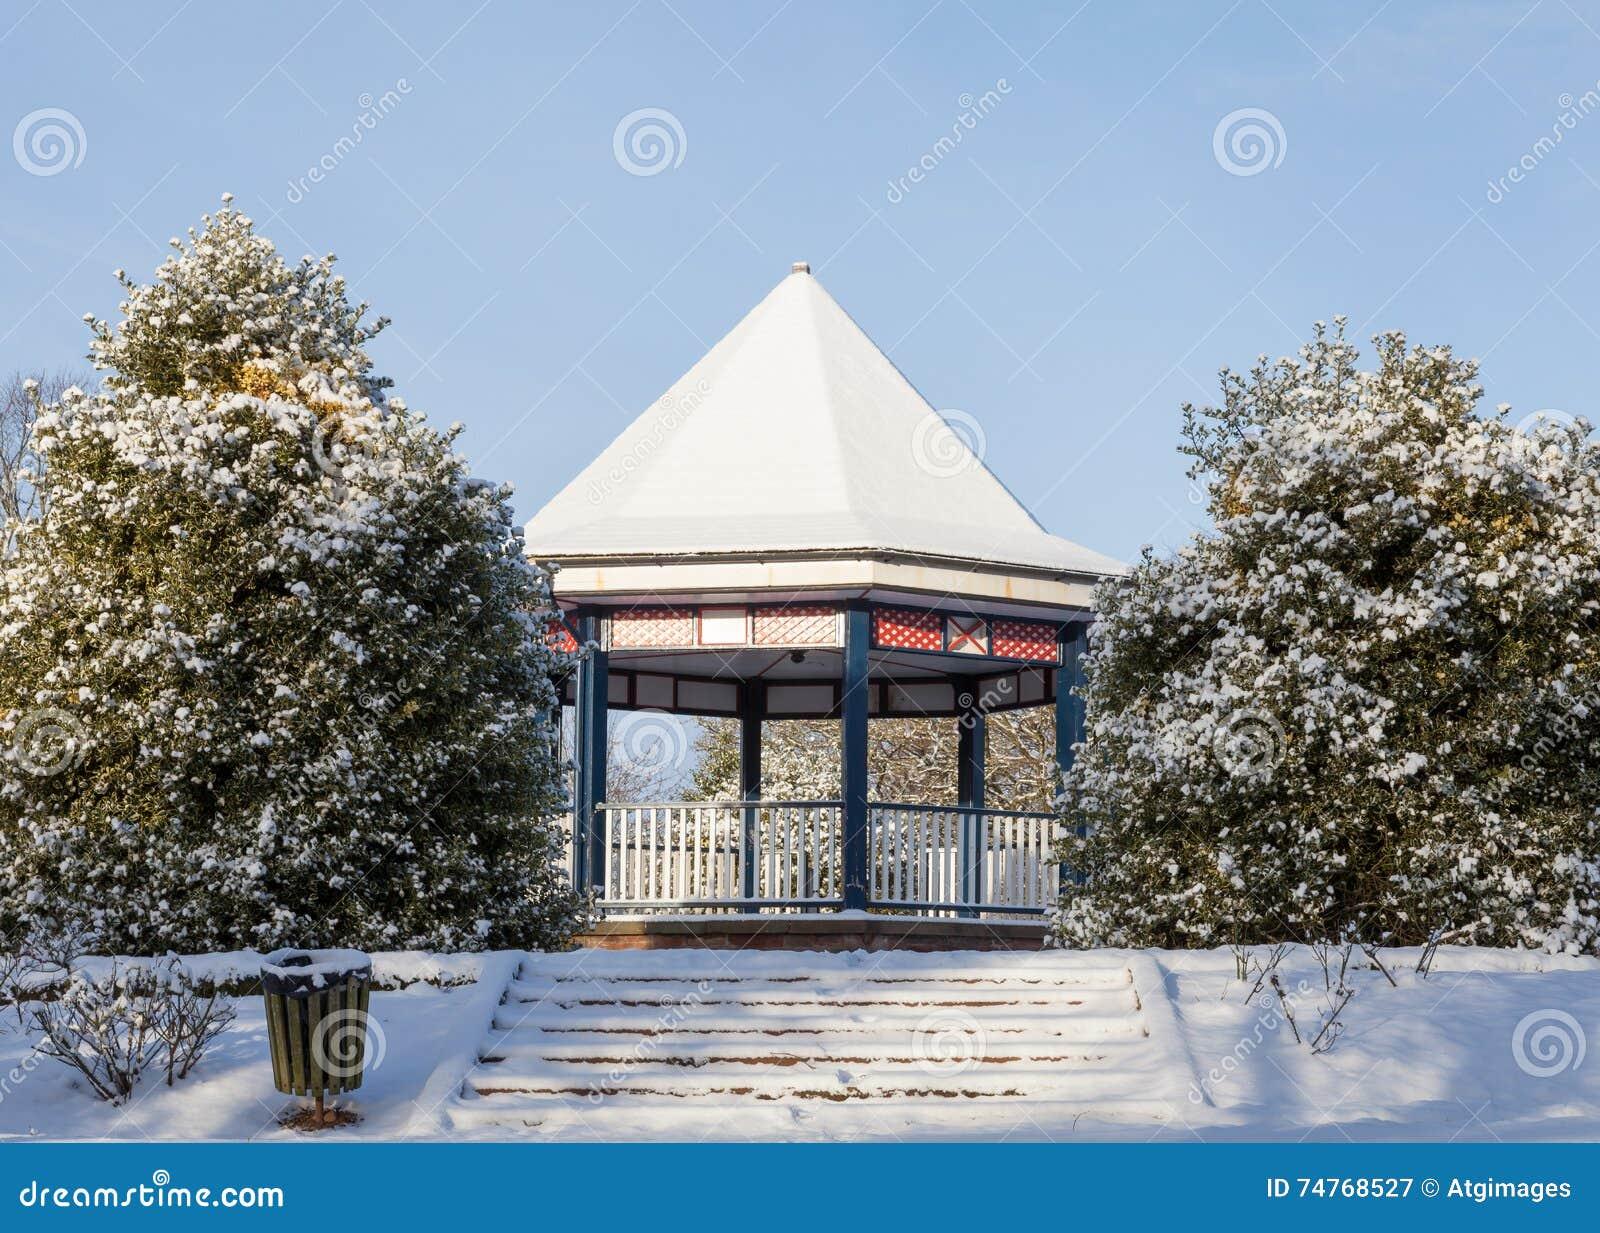 Penrith Bandstand